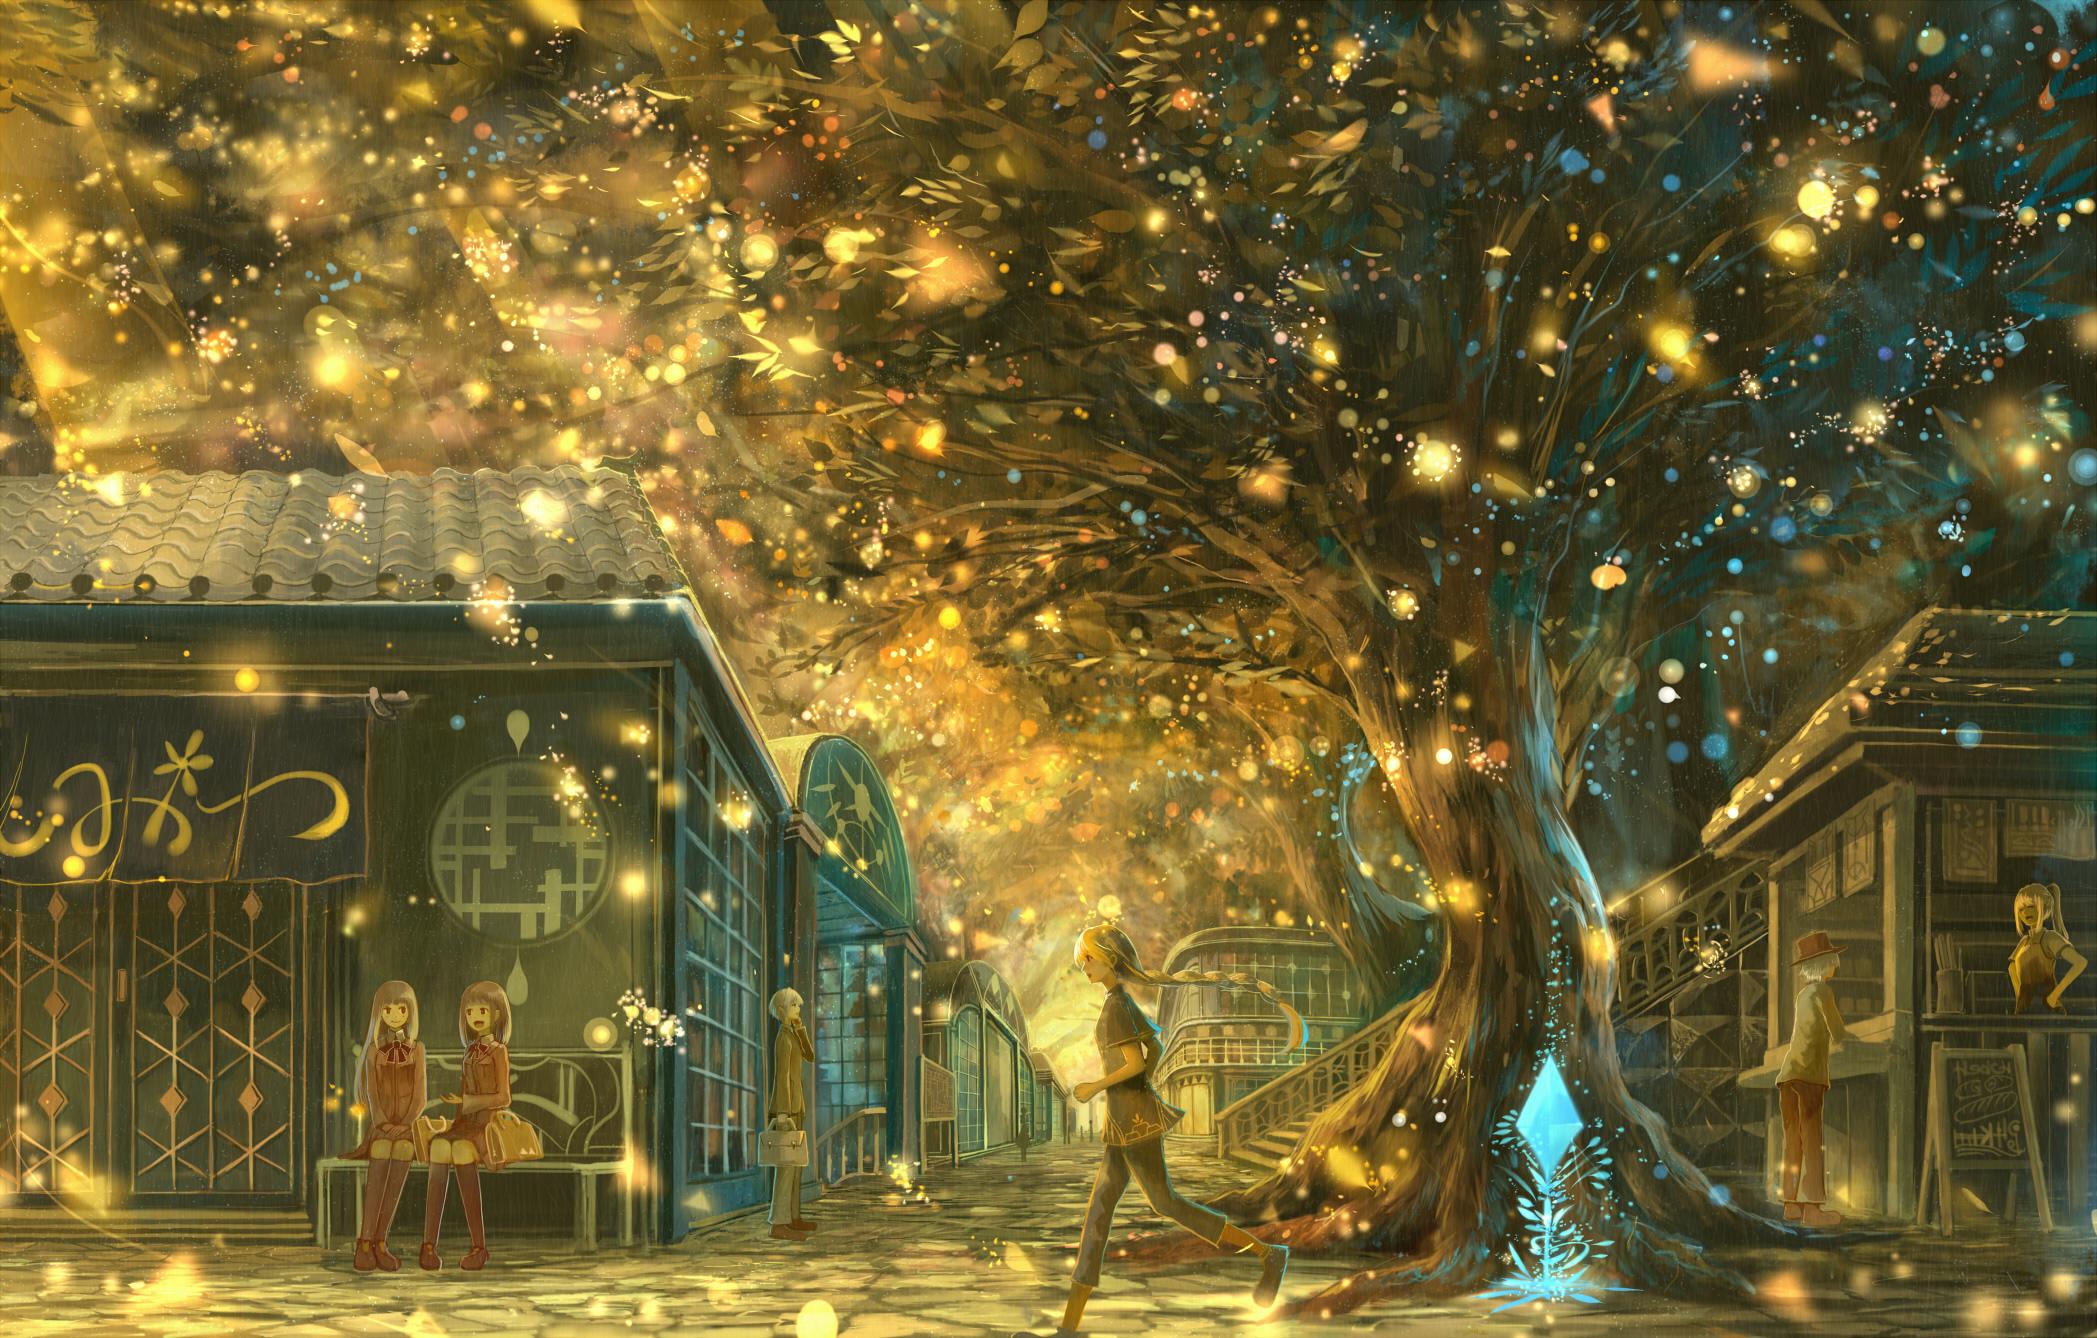 Beautiful Anime Girl Fantasy Forest Wallpaper Beautiful Landscapes 22 Fondo De Pantalla Hd Fondo De